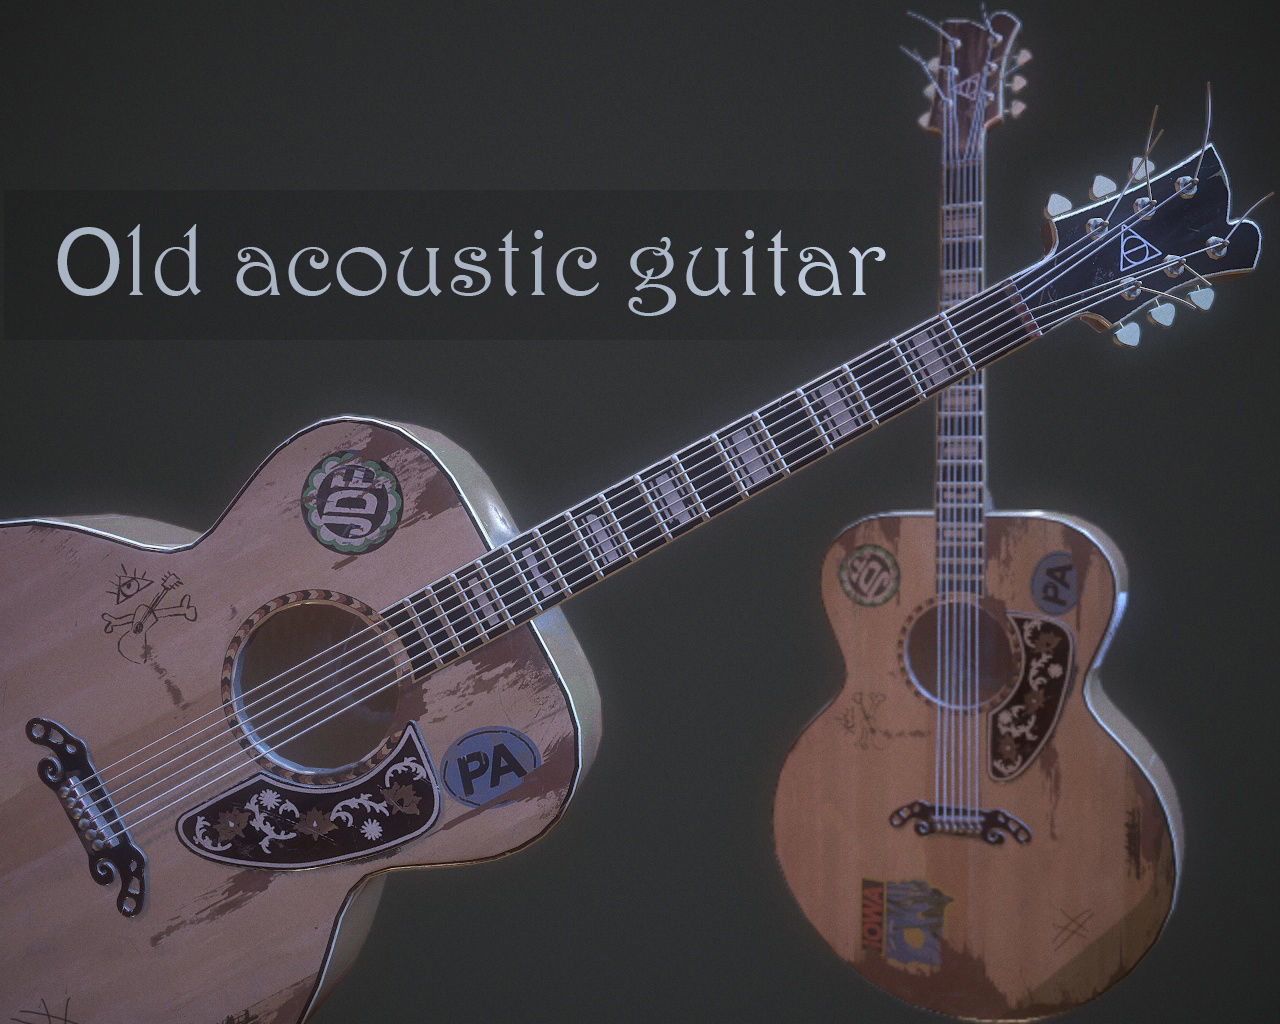 Old acoustic guitar pbr